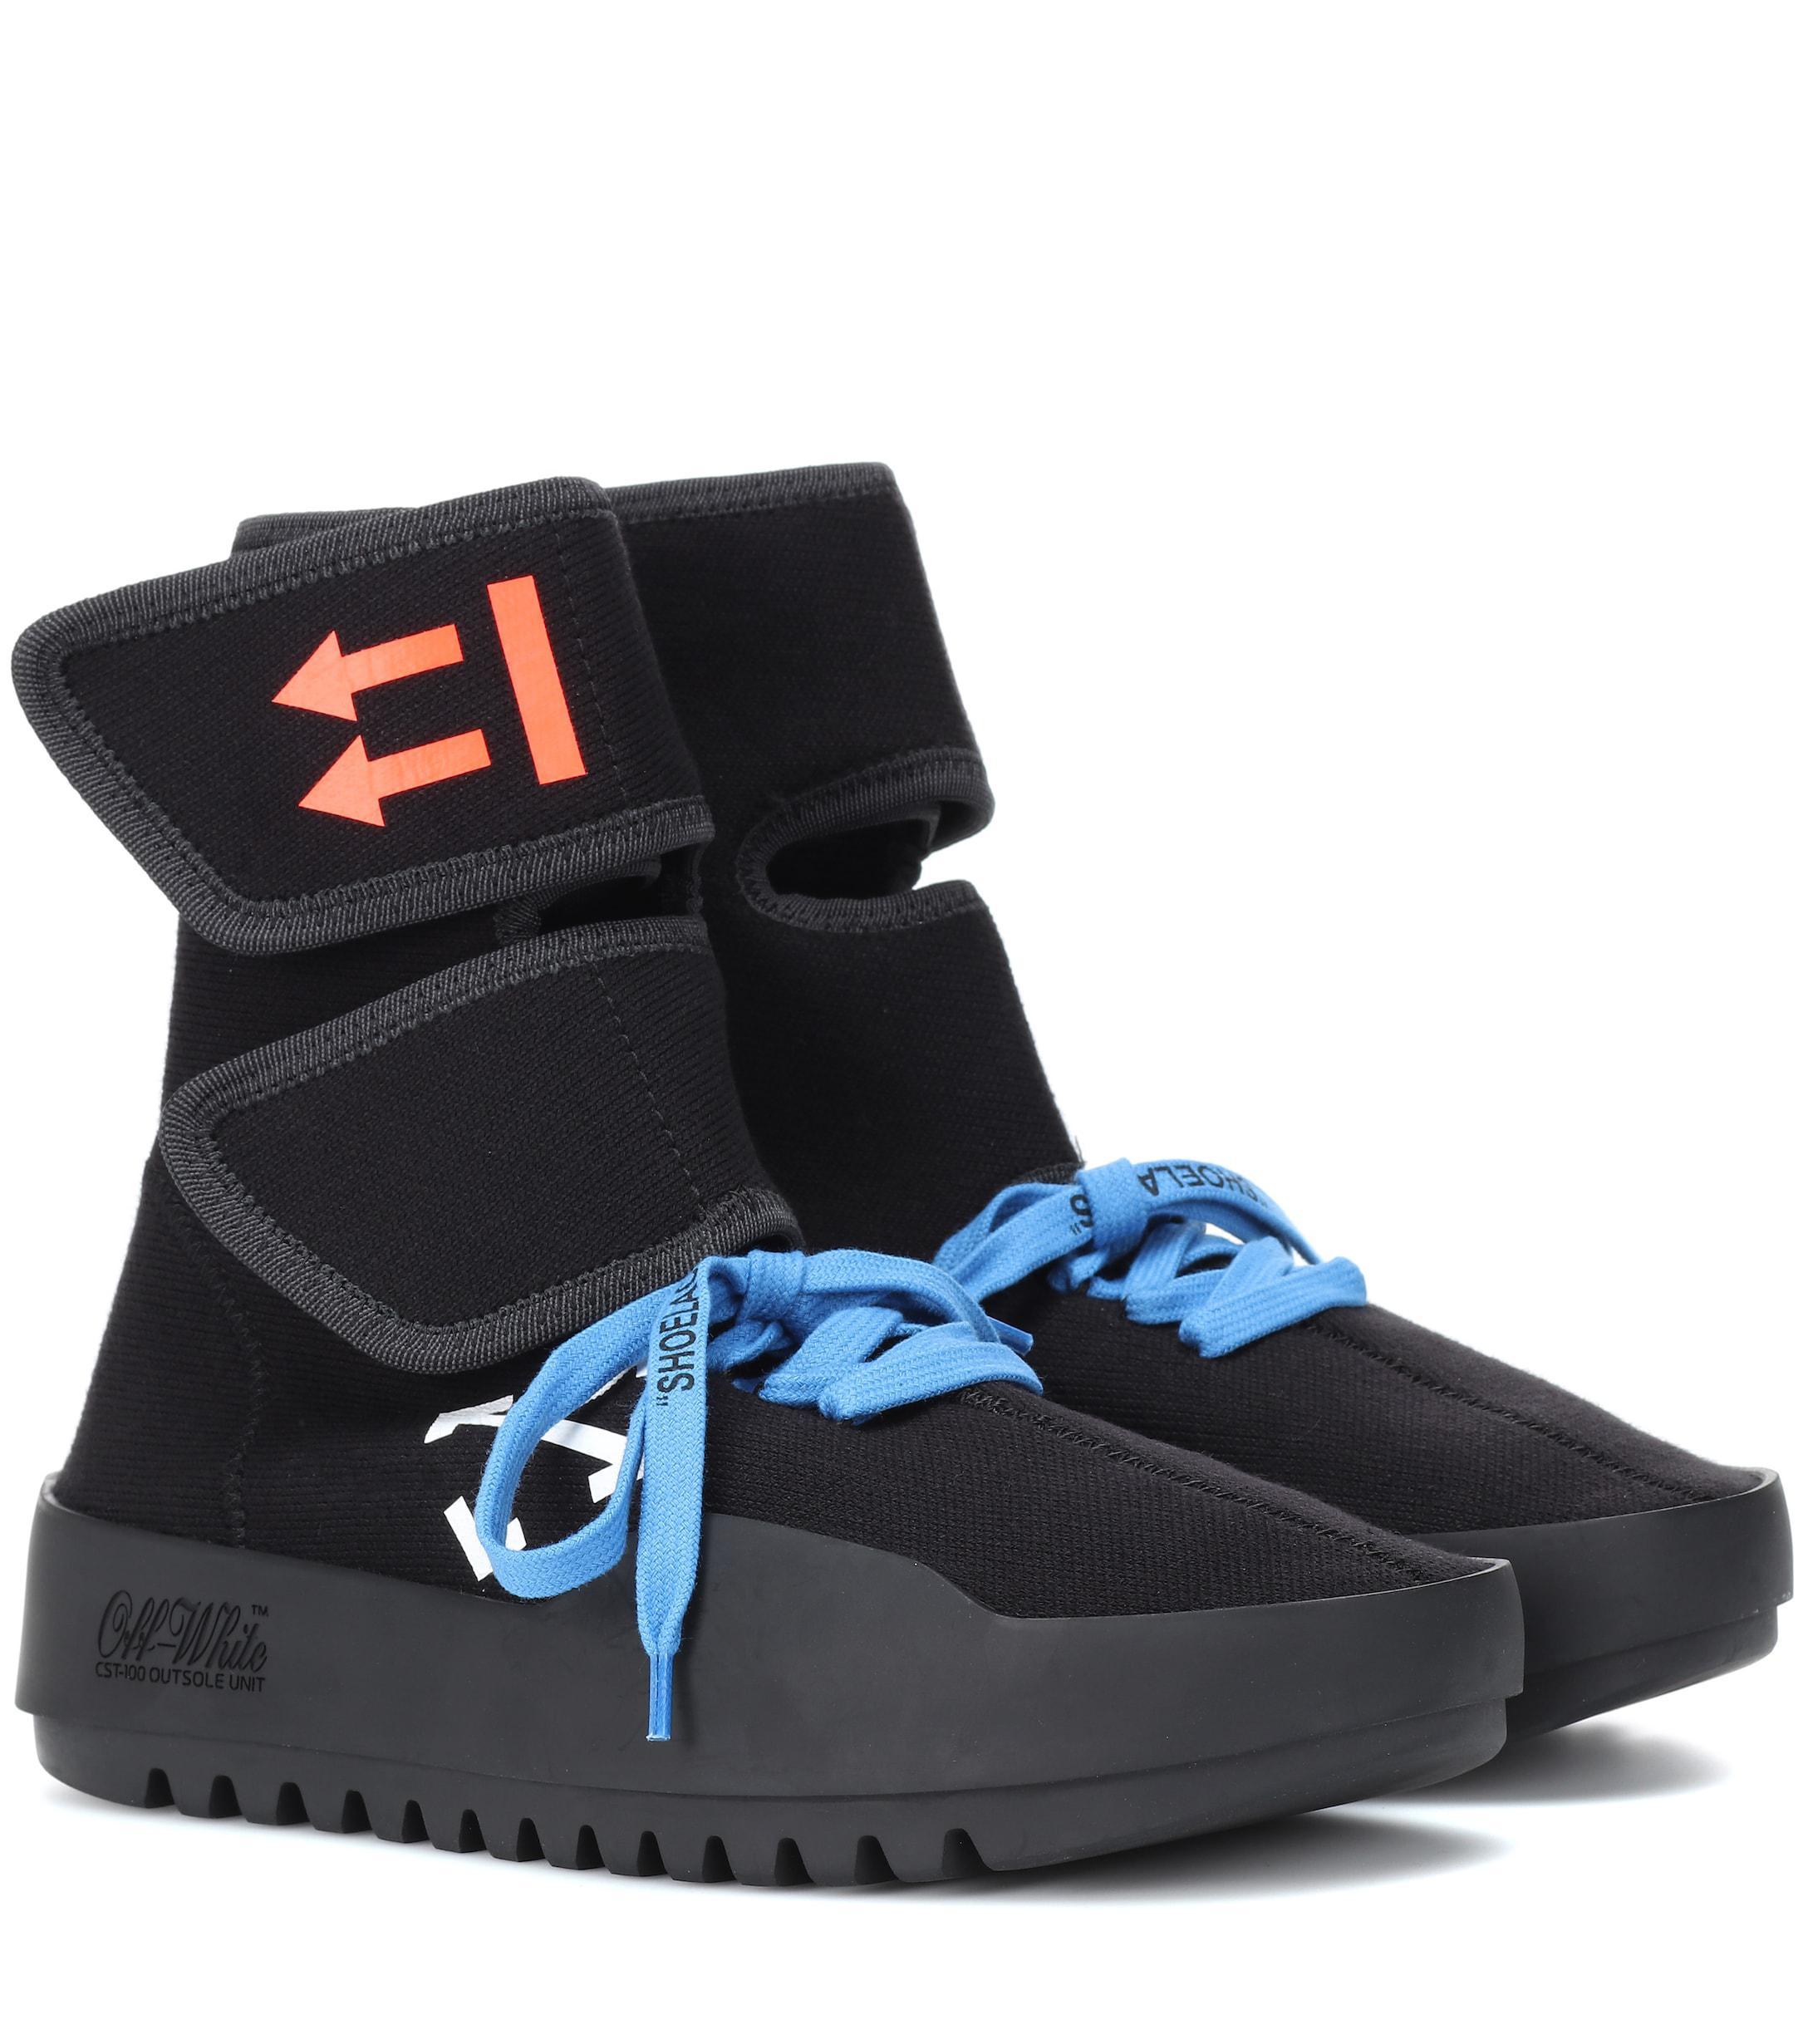 o Virgil Abloh Cst-001 Sneakers